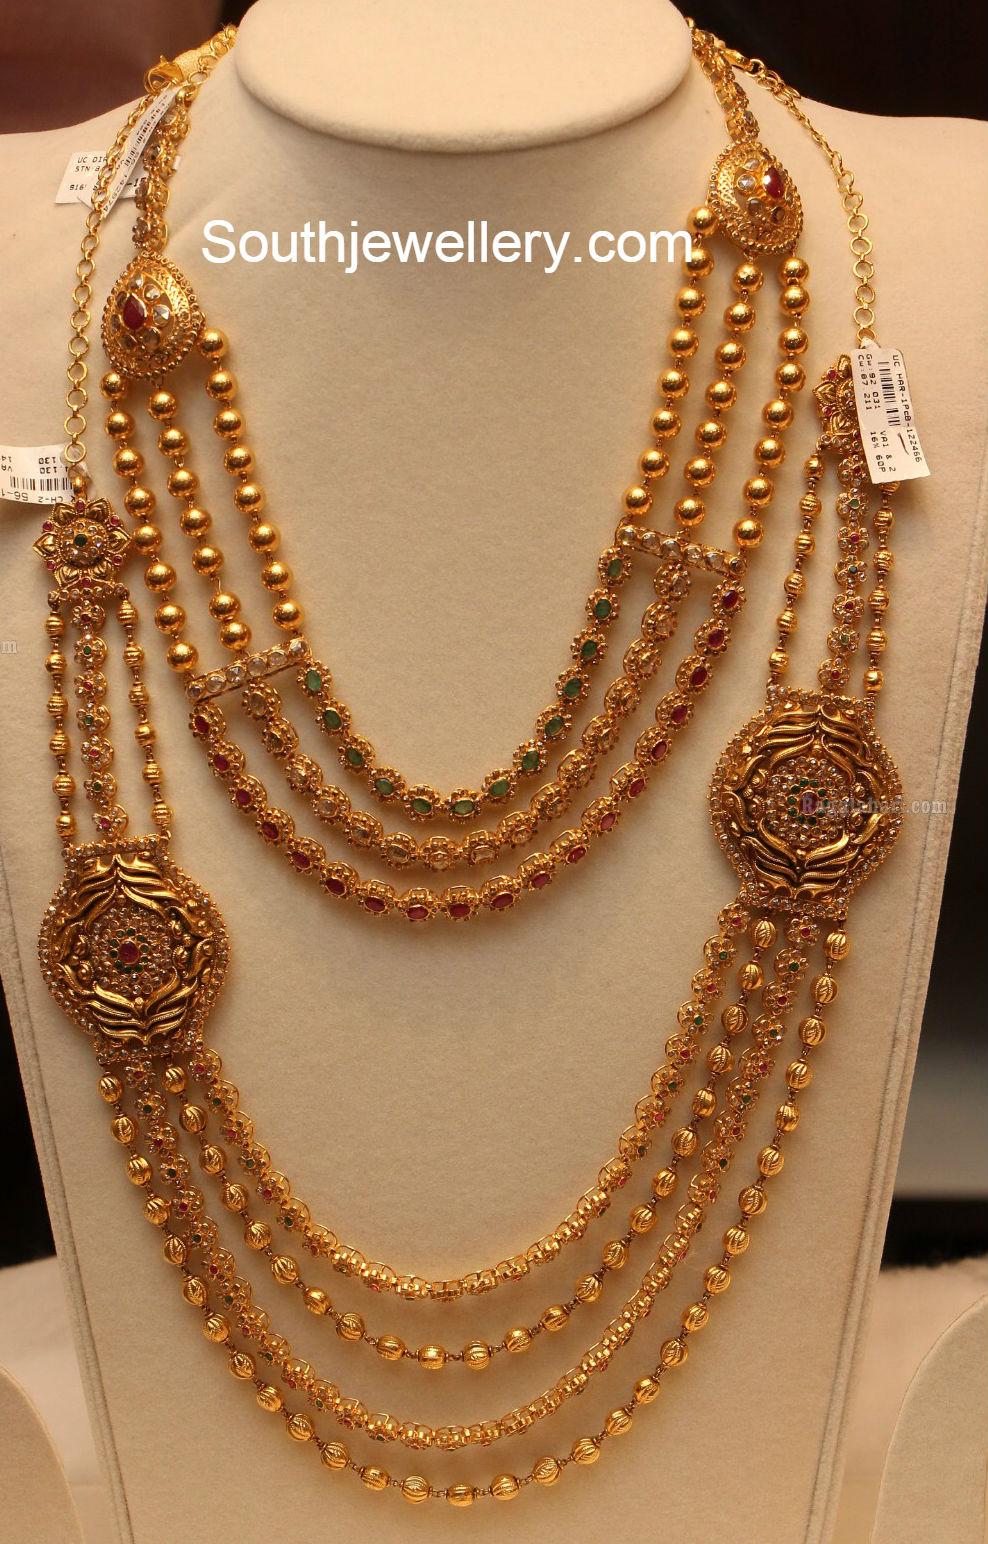 Long Diamond Necklace Designs